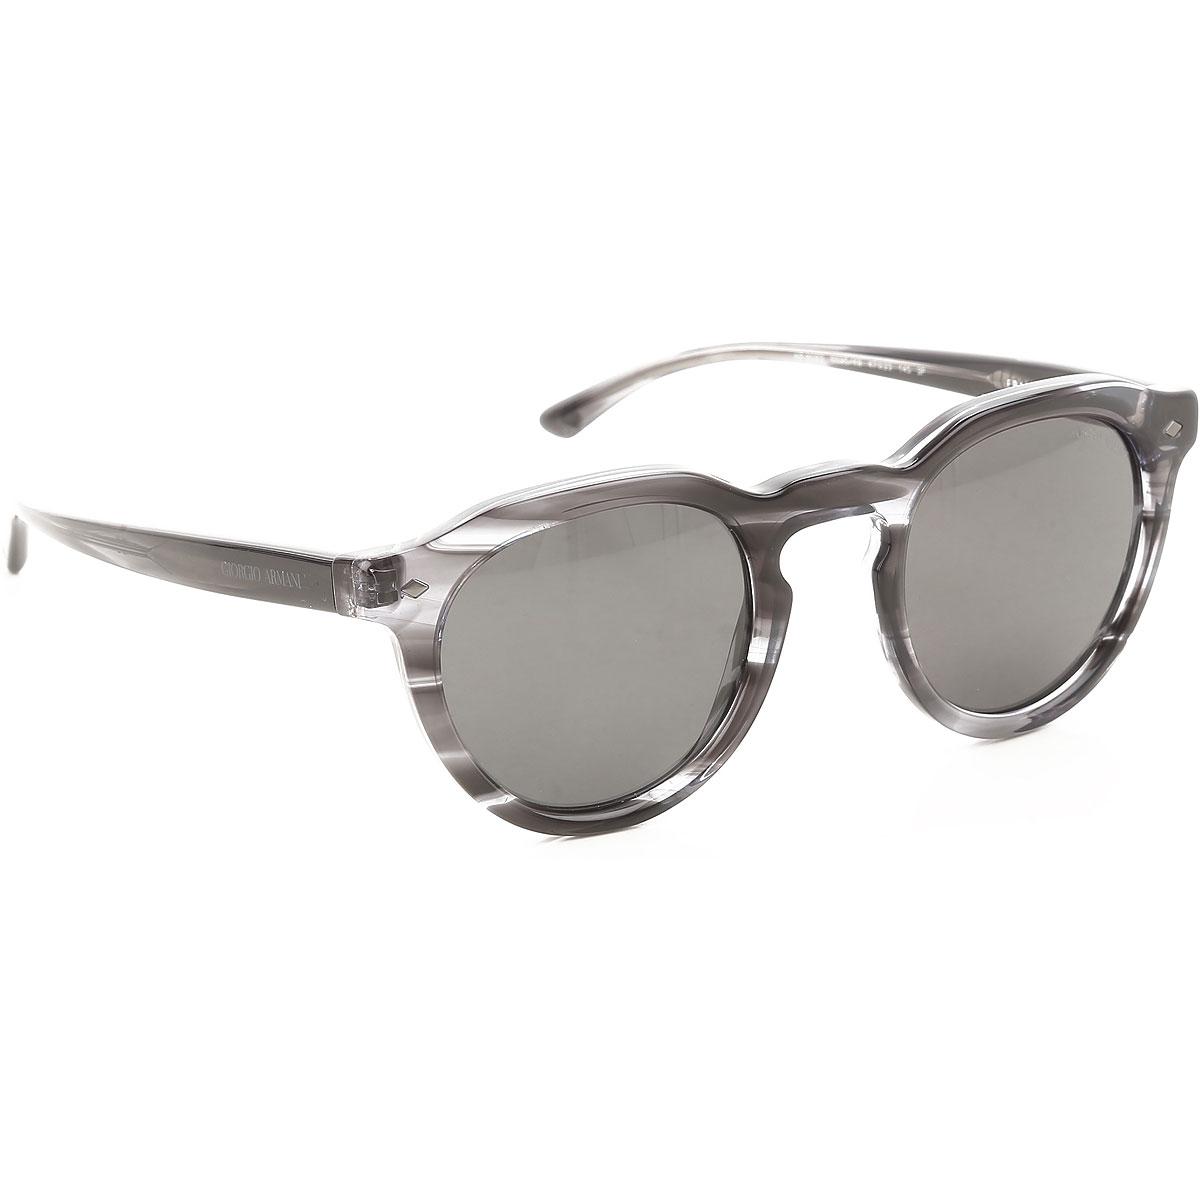 Giorgio Armani Sunglasses On Sale, Striped Grey, 2019